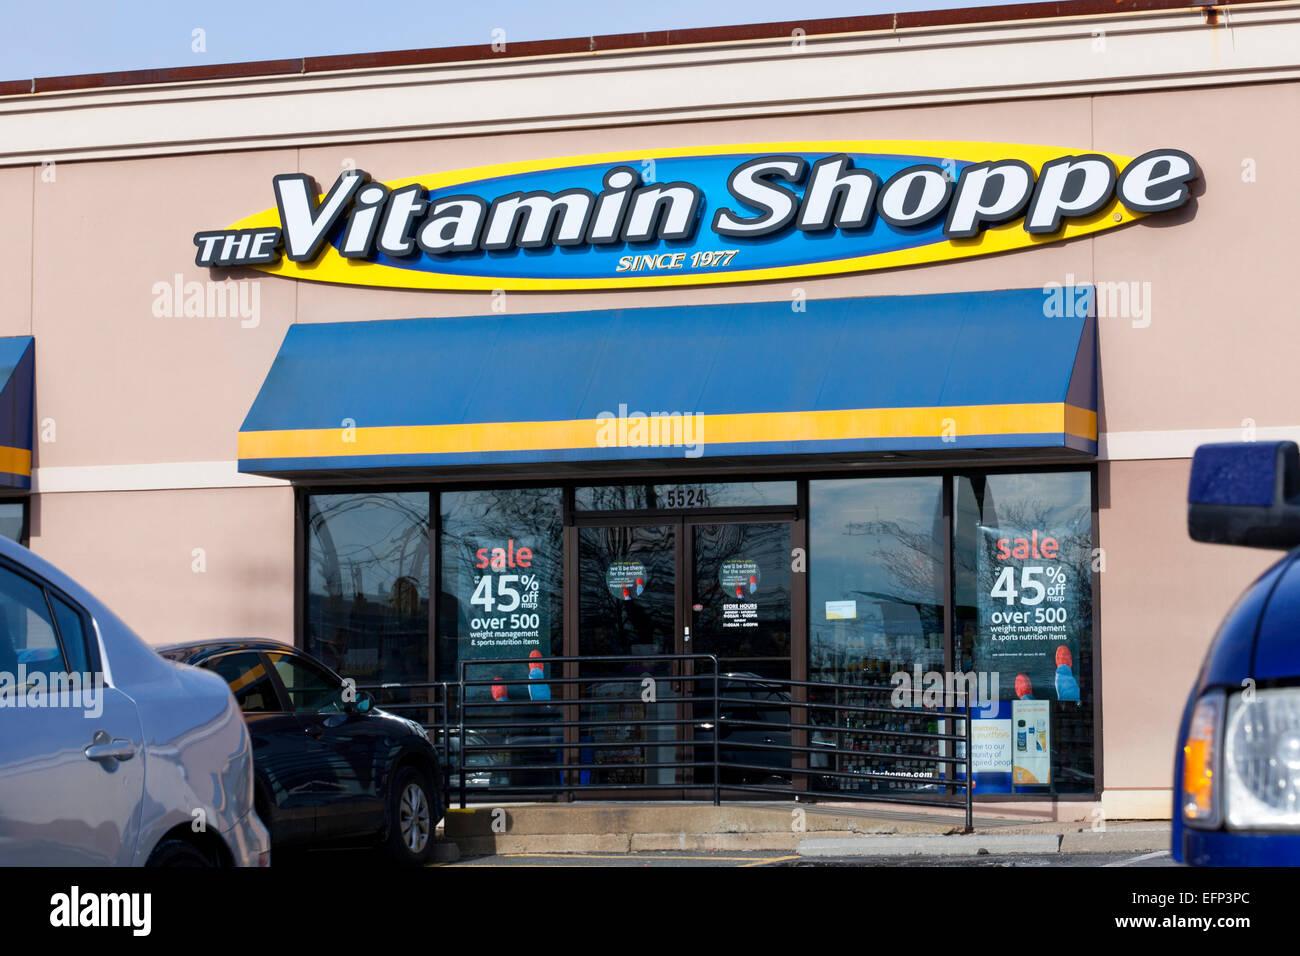 Vitamina Shoppe storefront - EE.UU. Imagen De Stock